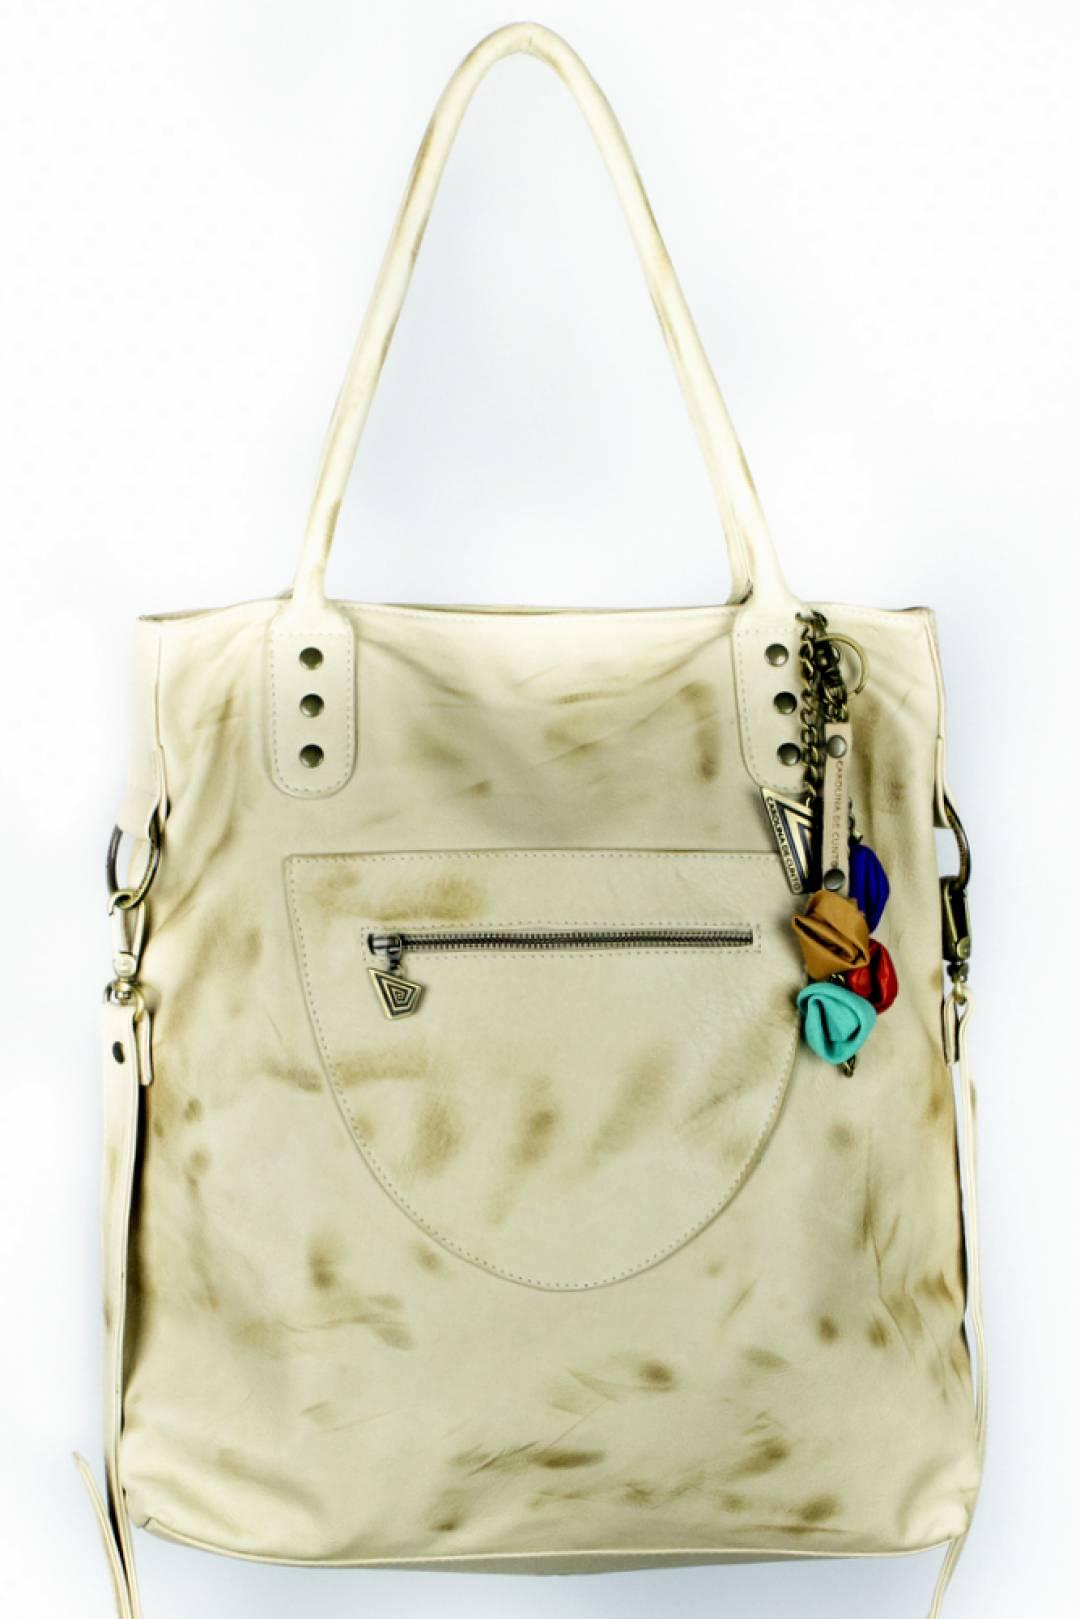 Manuela bag, elegant and spaciuos in ivory leather .